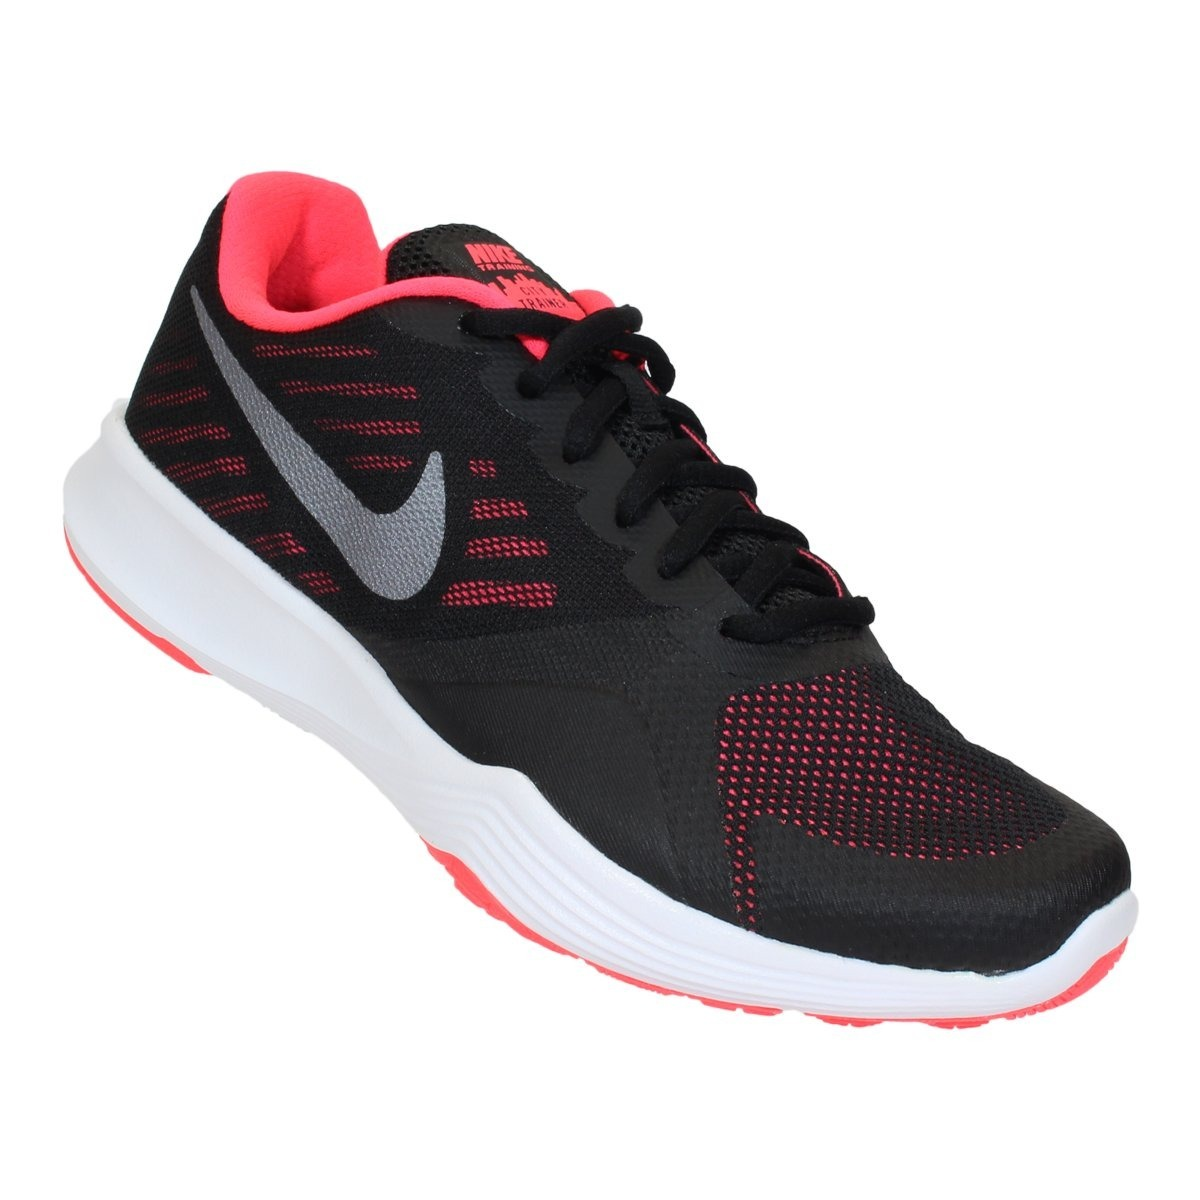 tênis nike city trainer feminino feminino cinza 85f849a4798fb7 ... 94b8459c9c08b